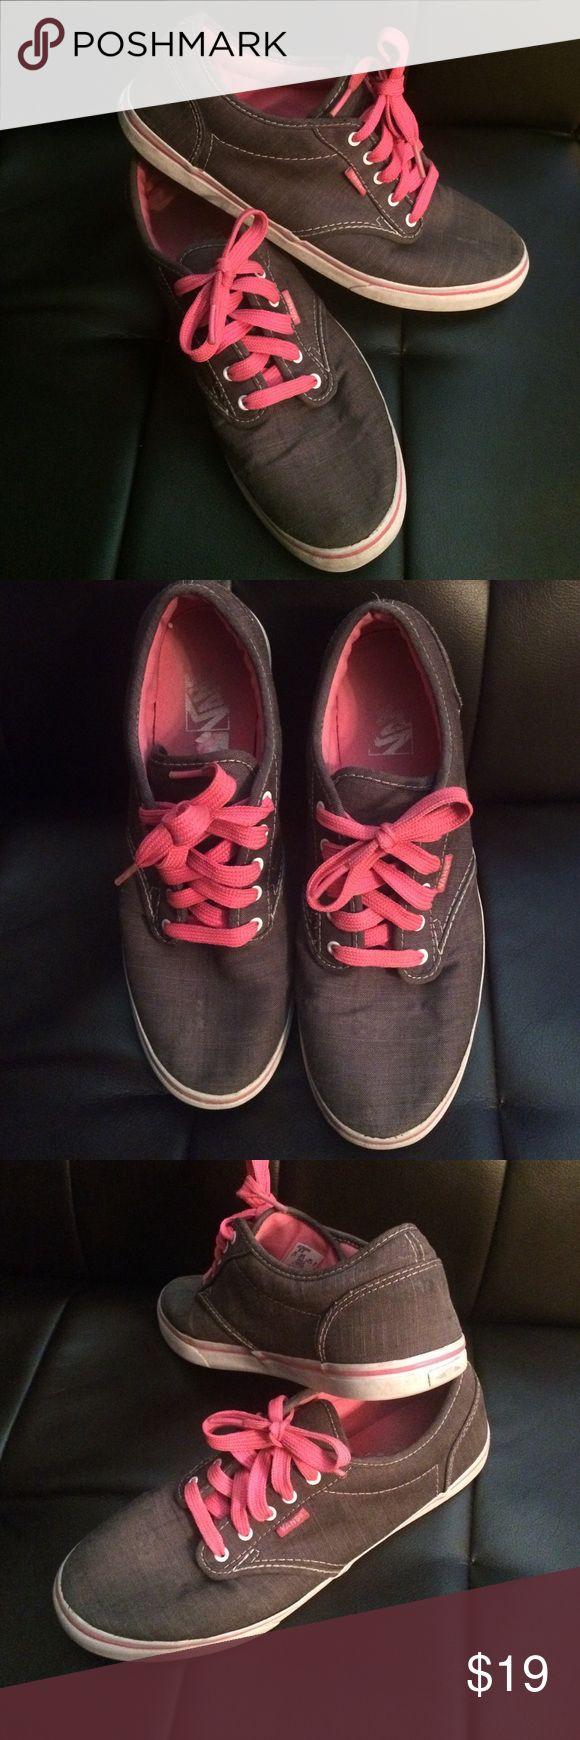 ⚡️weekend Sale ⚡️was $20 Gray/pink Vans Cute gray and pink Vans, gently worn, women's size 9, very comfortable Vans Shoes Sneakers